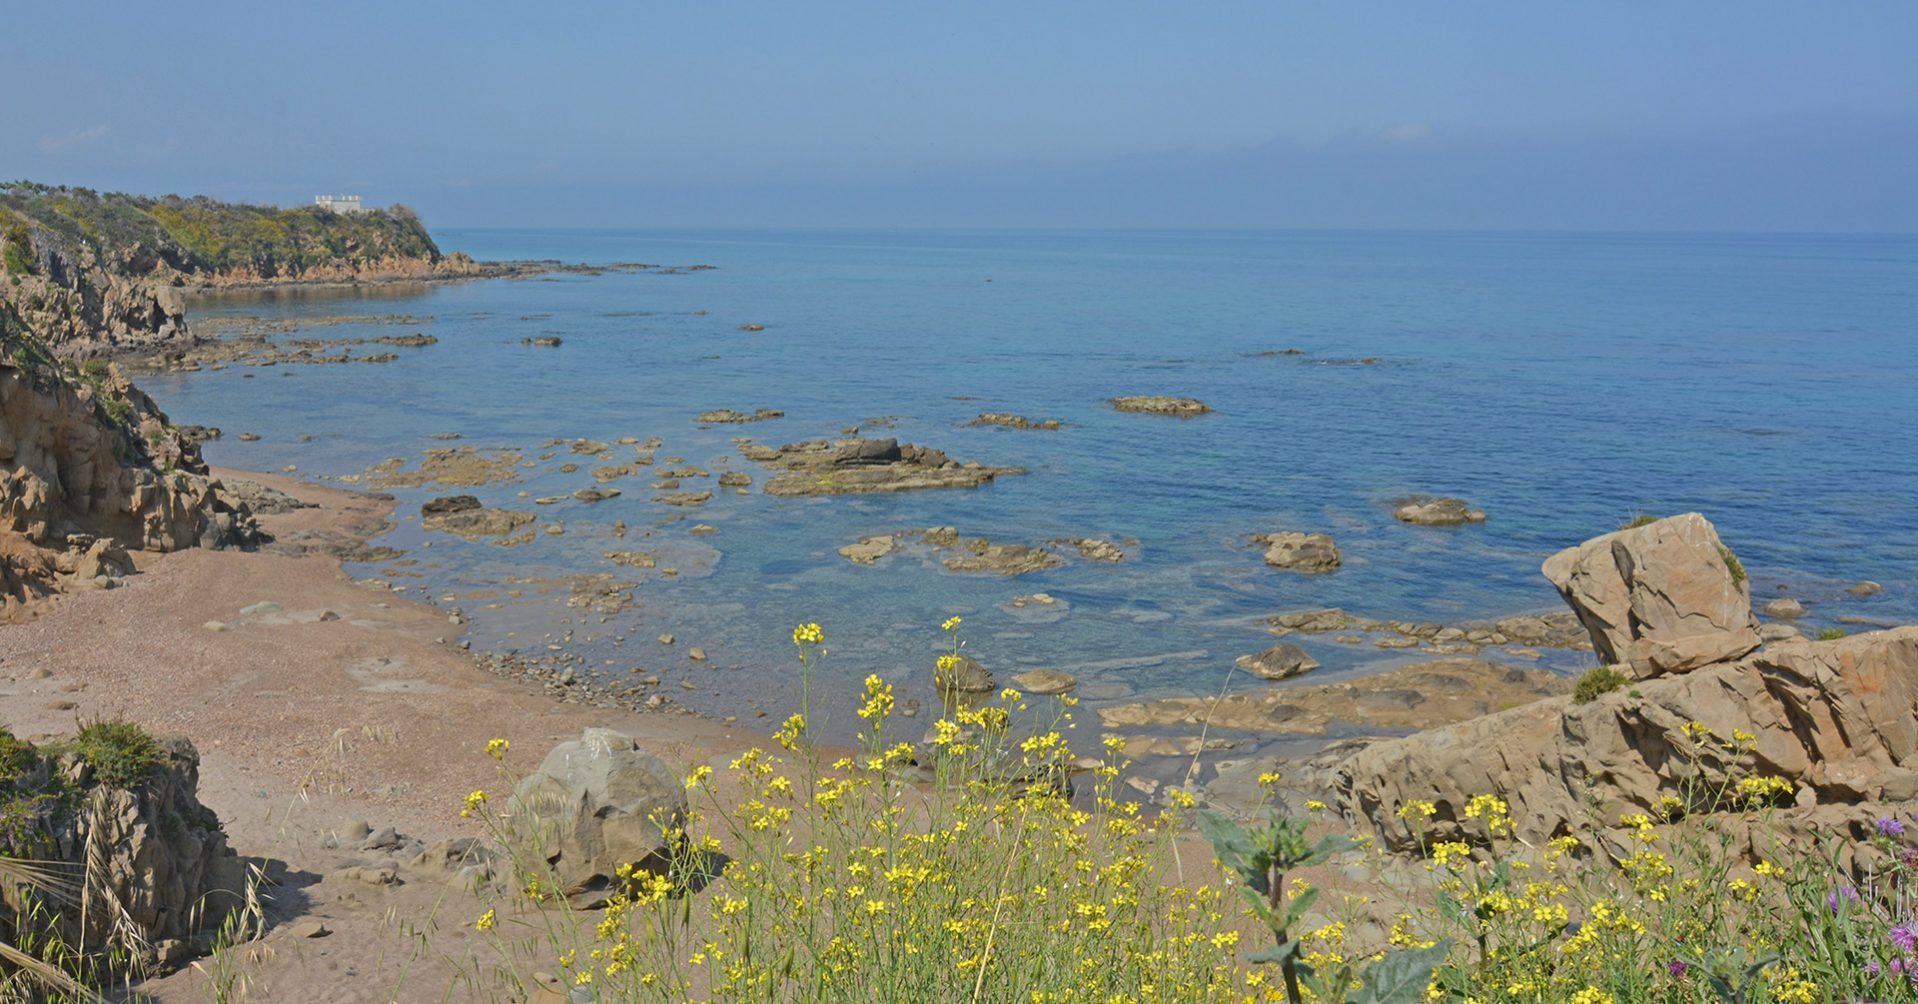 spiaggia-mazzaforno-cefalu-featured